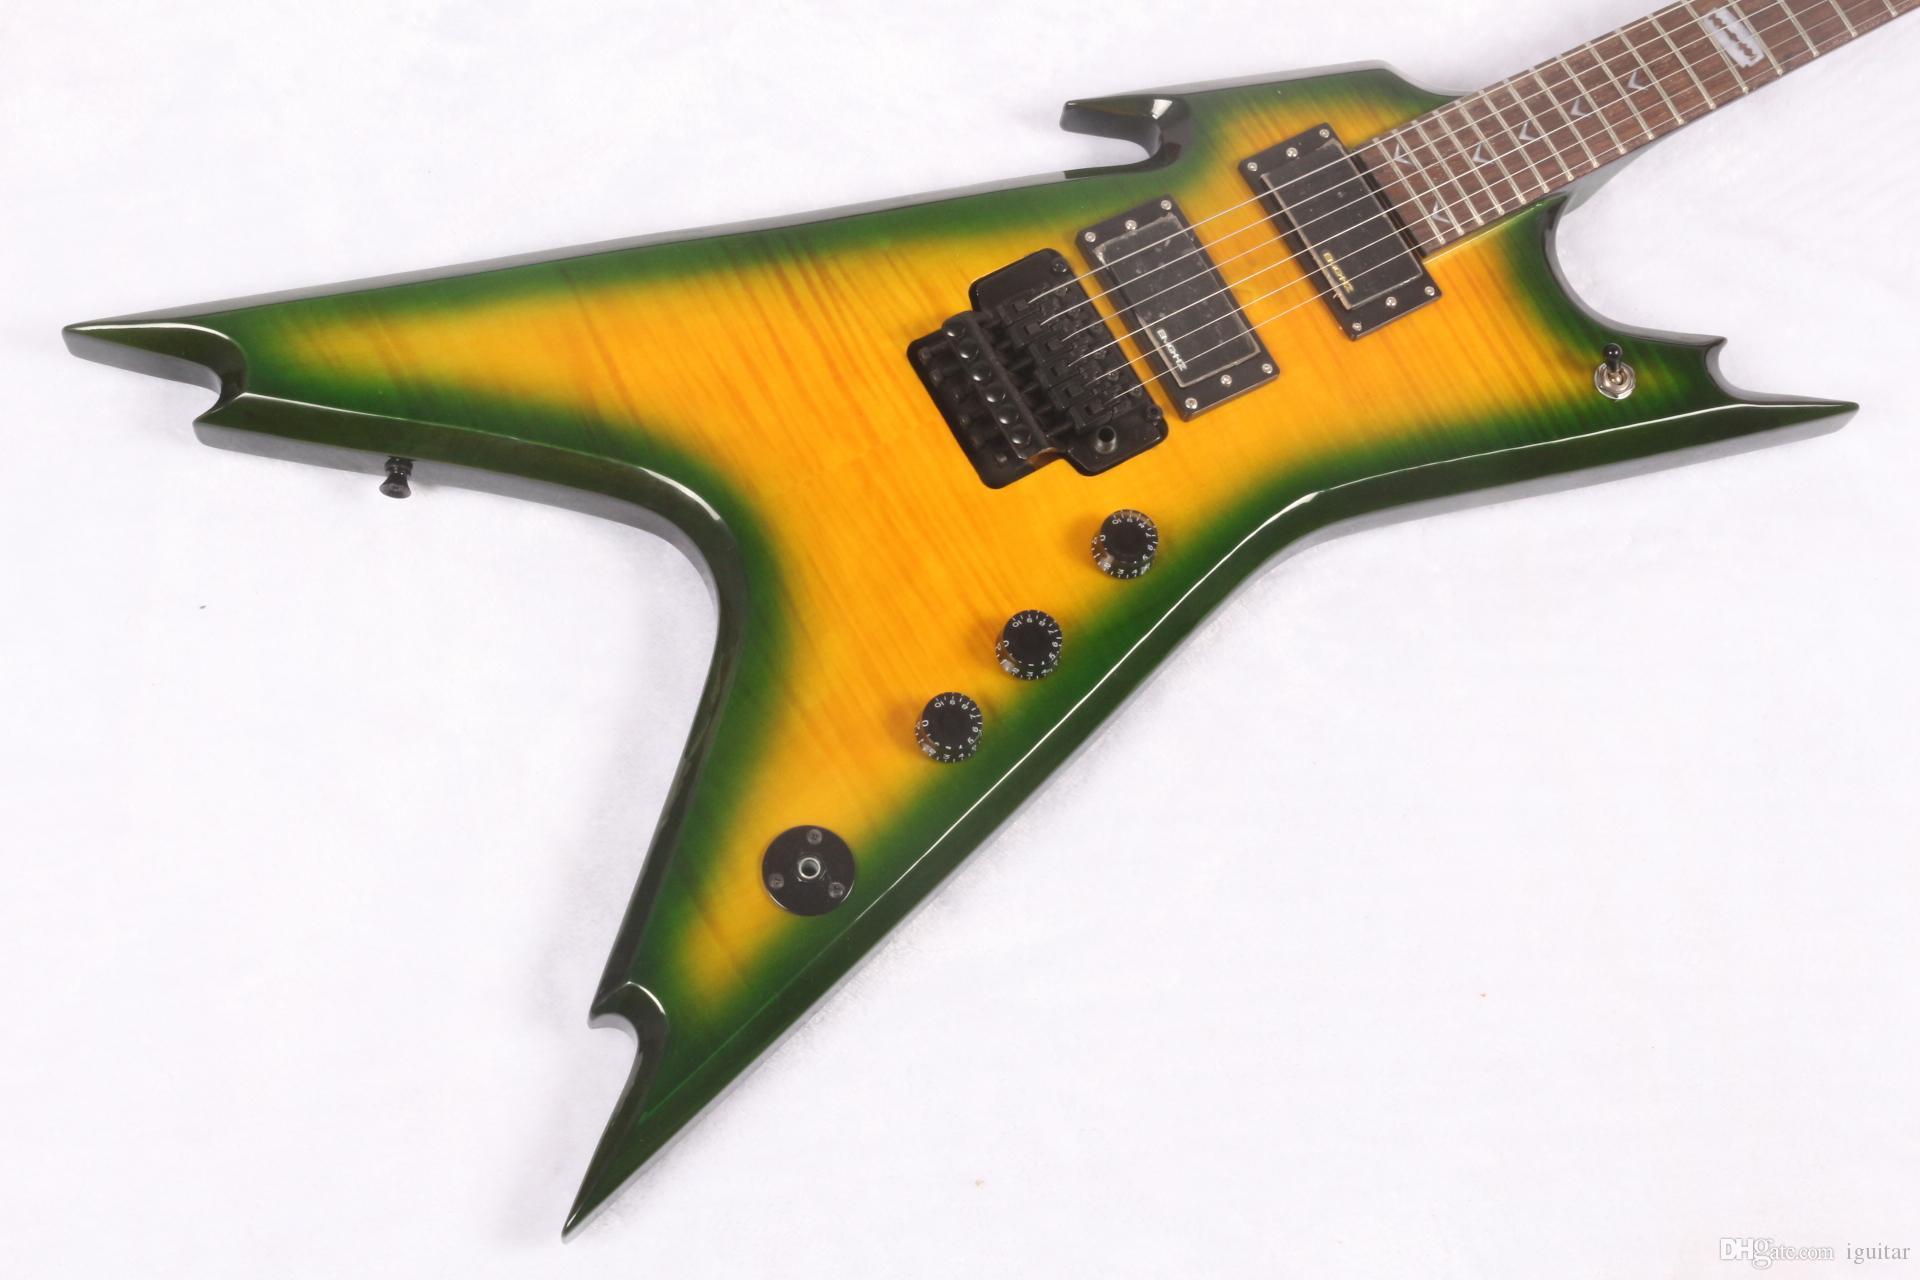 new custom dean dime razorback electric guitar flying v yellow green body emghz 81 85 active. Black Bedroom Furniture Sets. Home Design Ideas